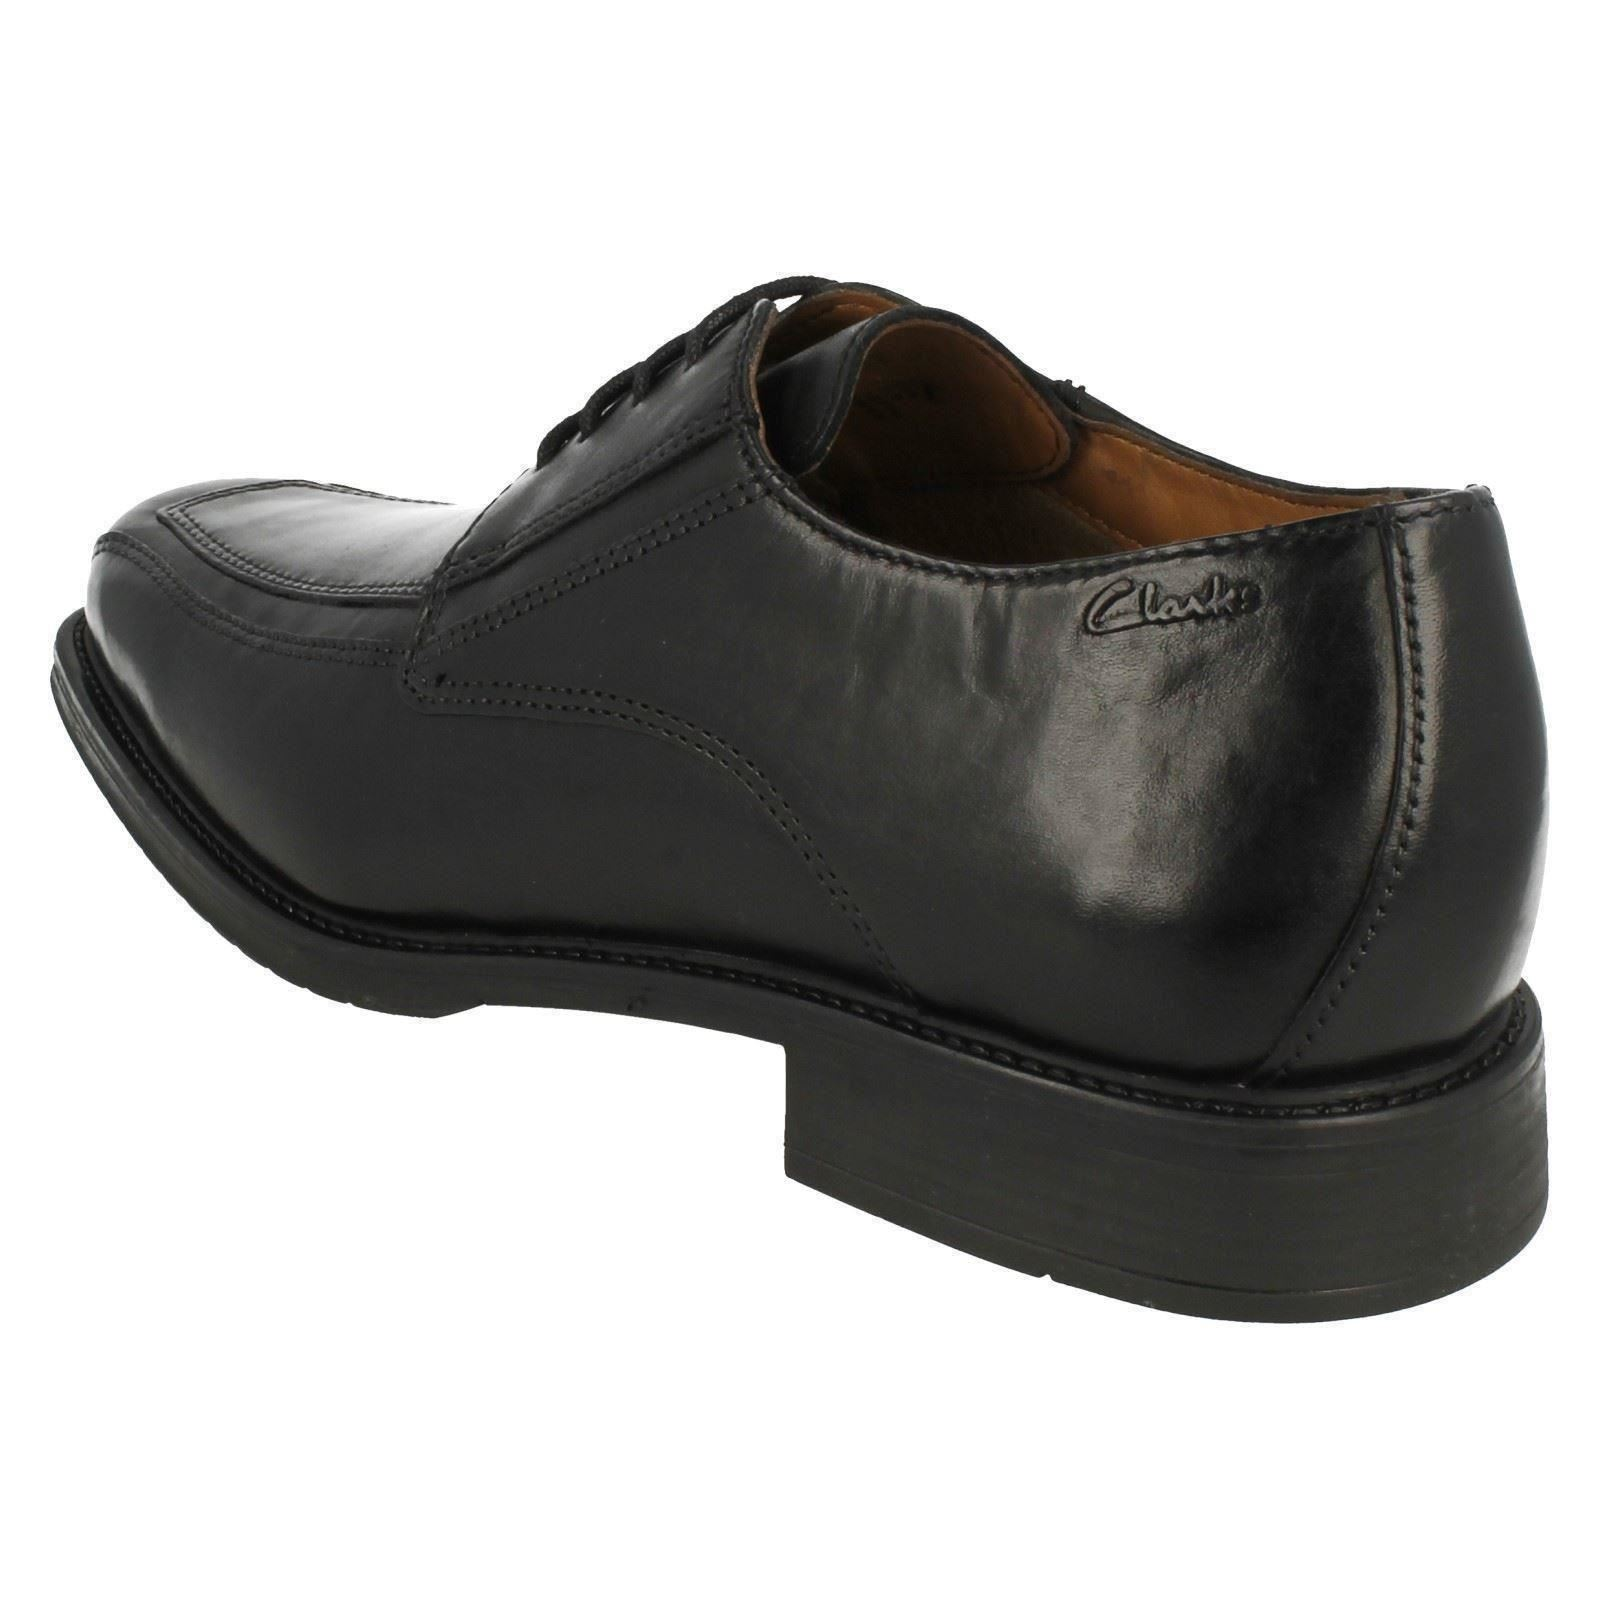 Uomo Clarks Driggs Walk Schuhes Lace Up Schuhes Walk 5b8e68